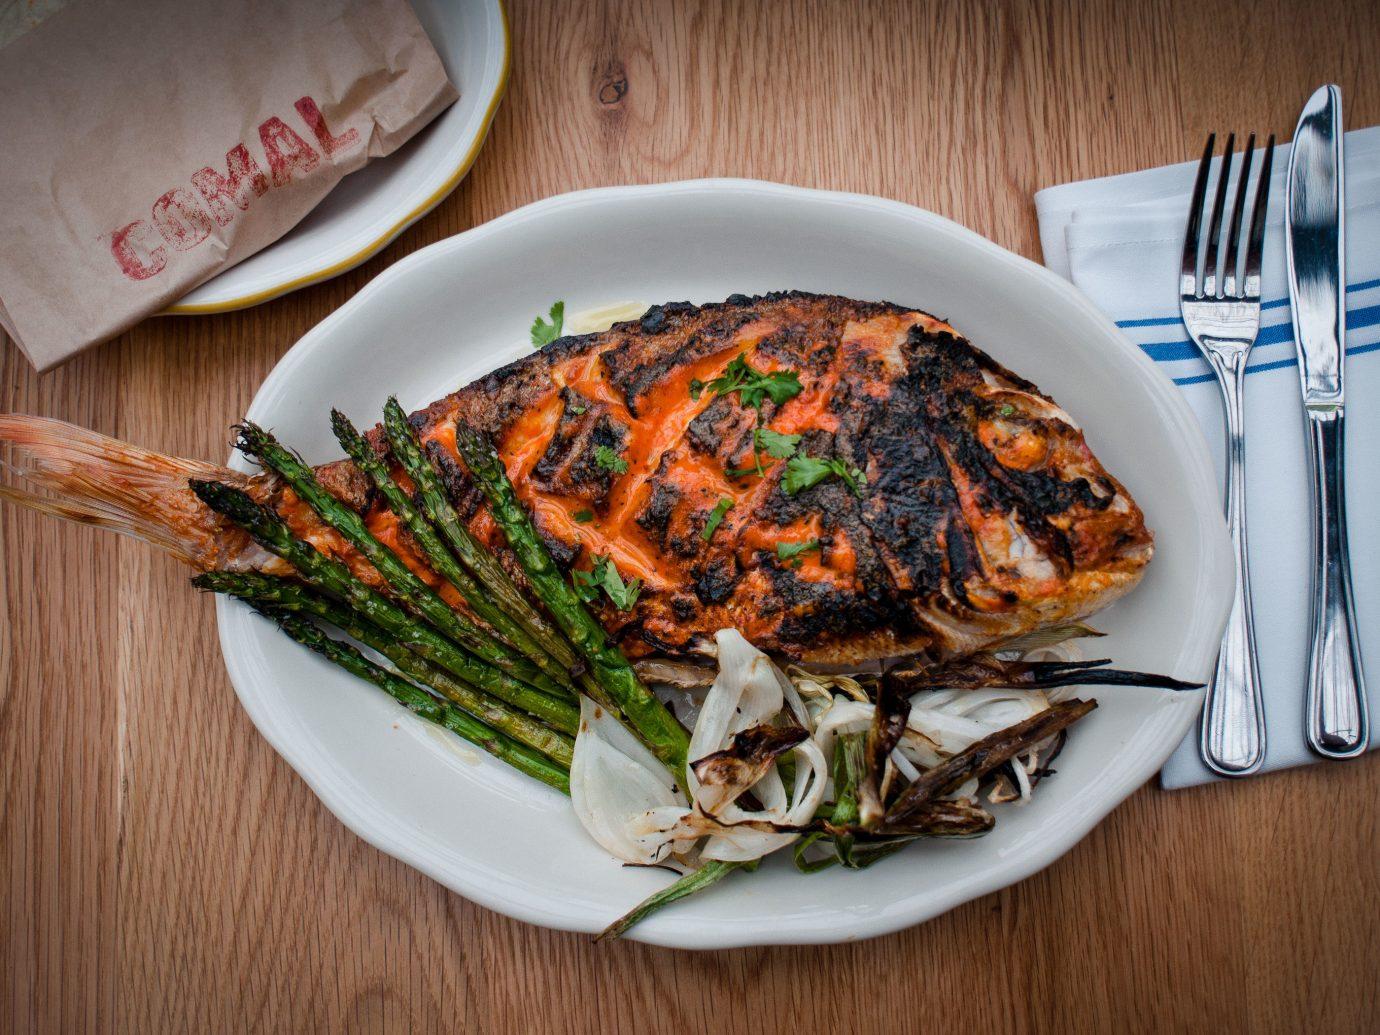 Trip Ideas plate food table dish produce meal vegetable fish cuisine sliced